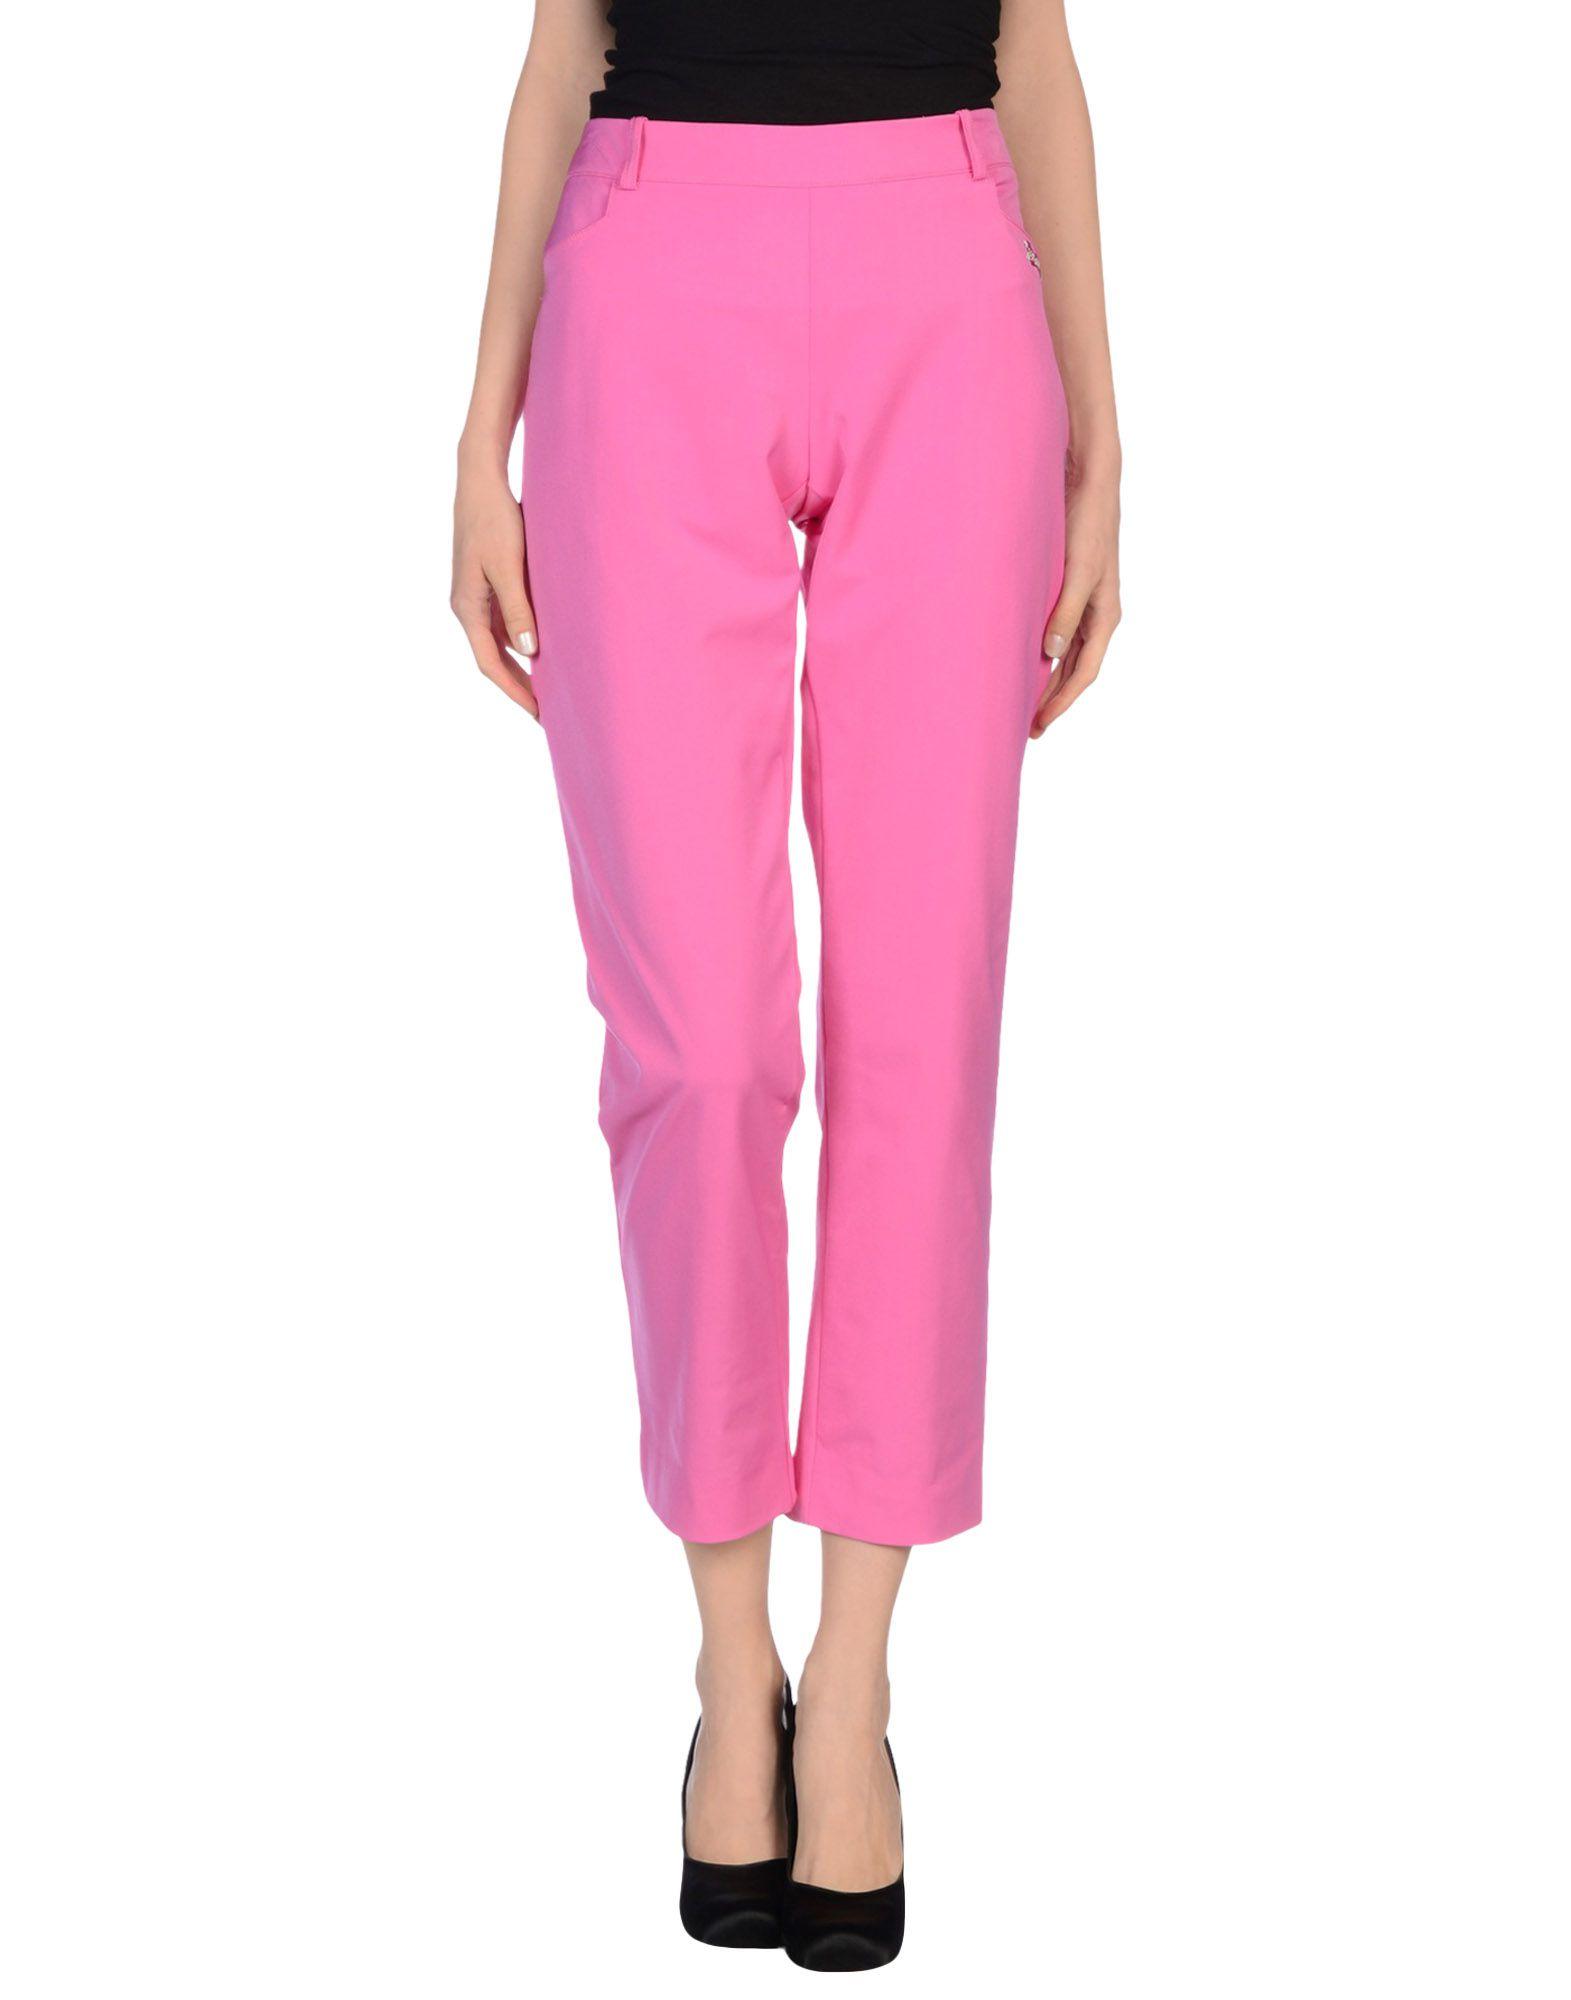 VDP COLLECTION Damen Hose Farbe Fuchsia Größe 5